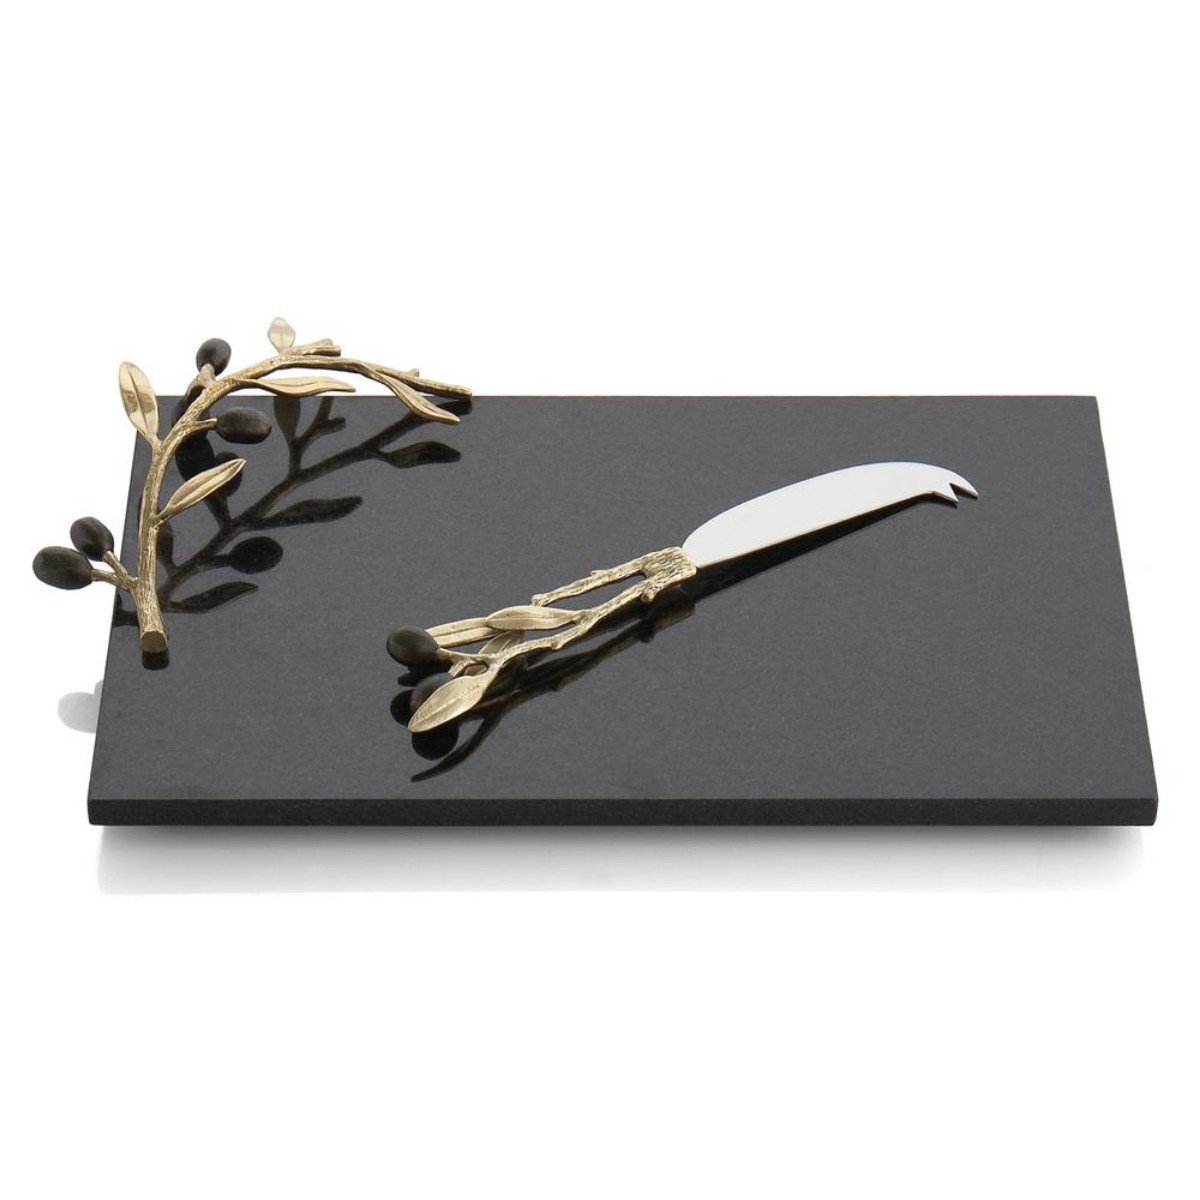 Michael Aram I Olive Branch Cheese Board w/ Knife